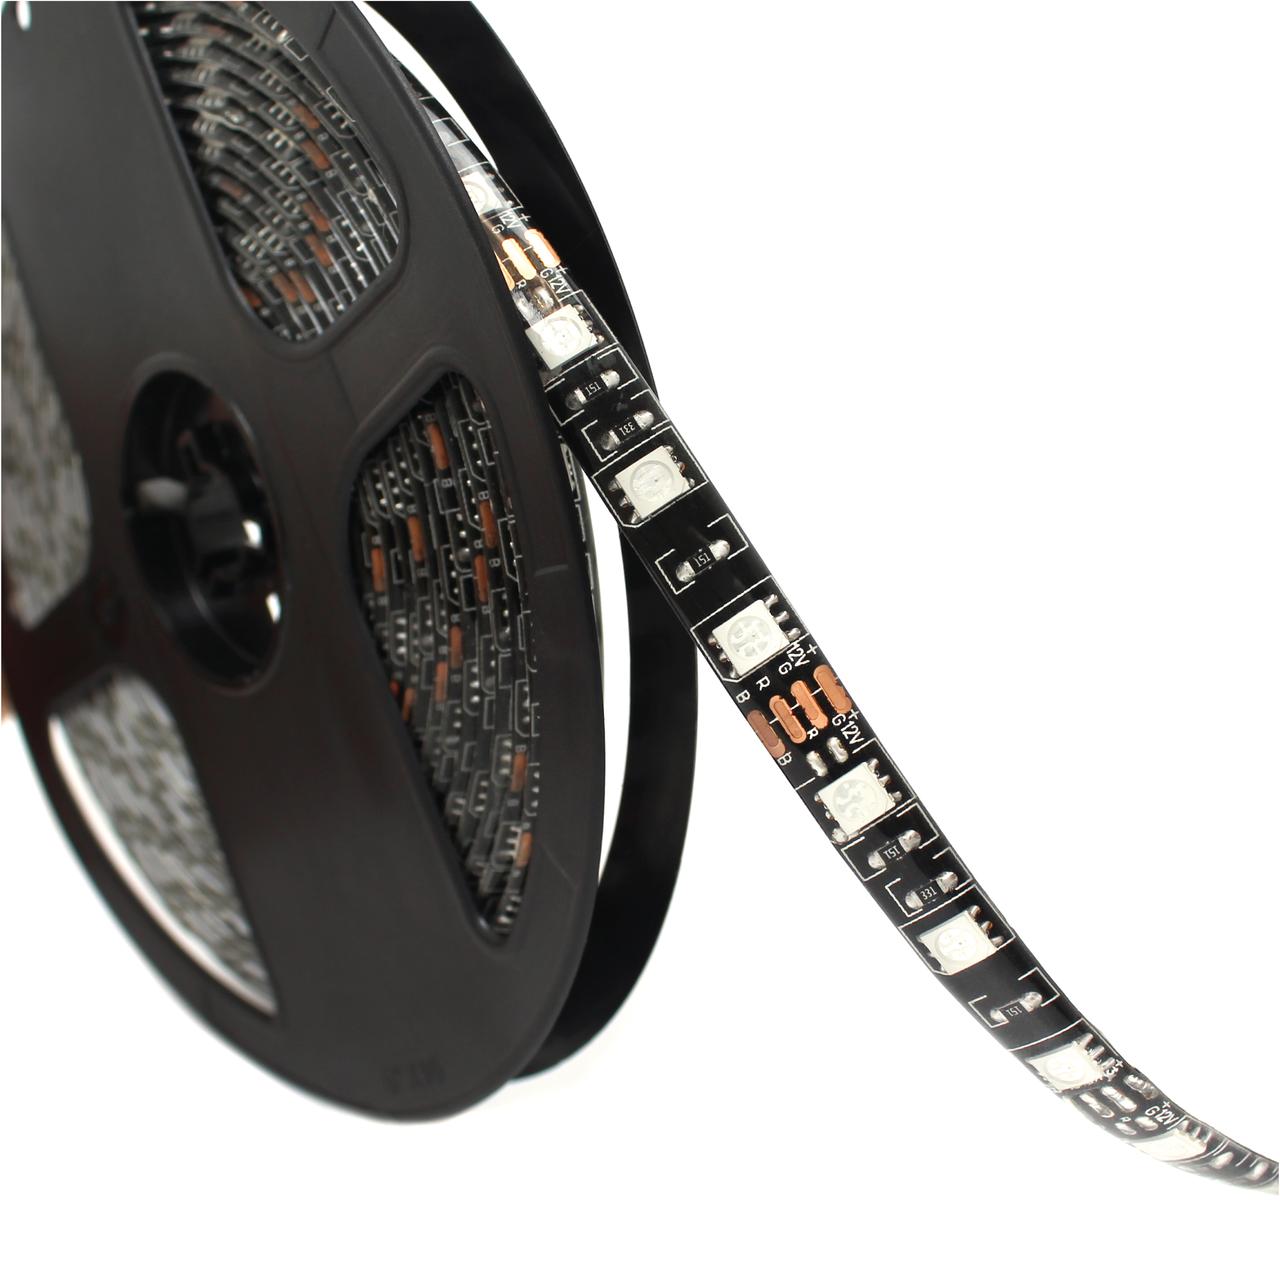 12V RGB LED Strip - 5m